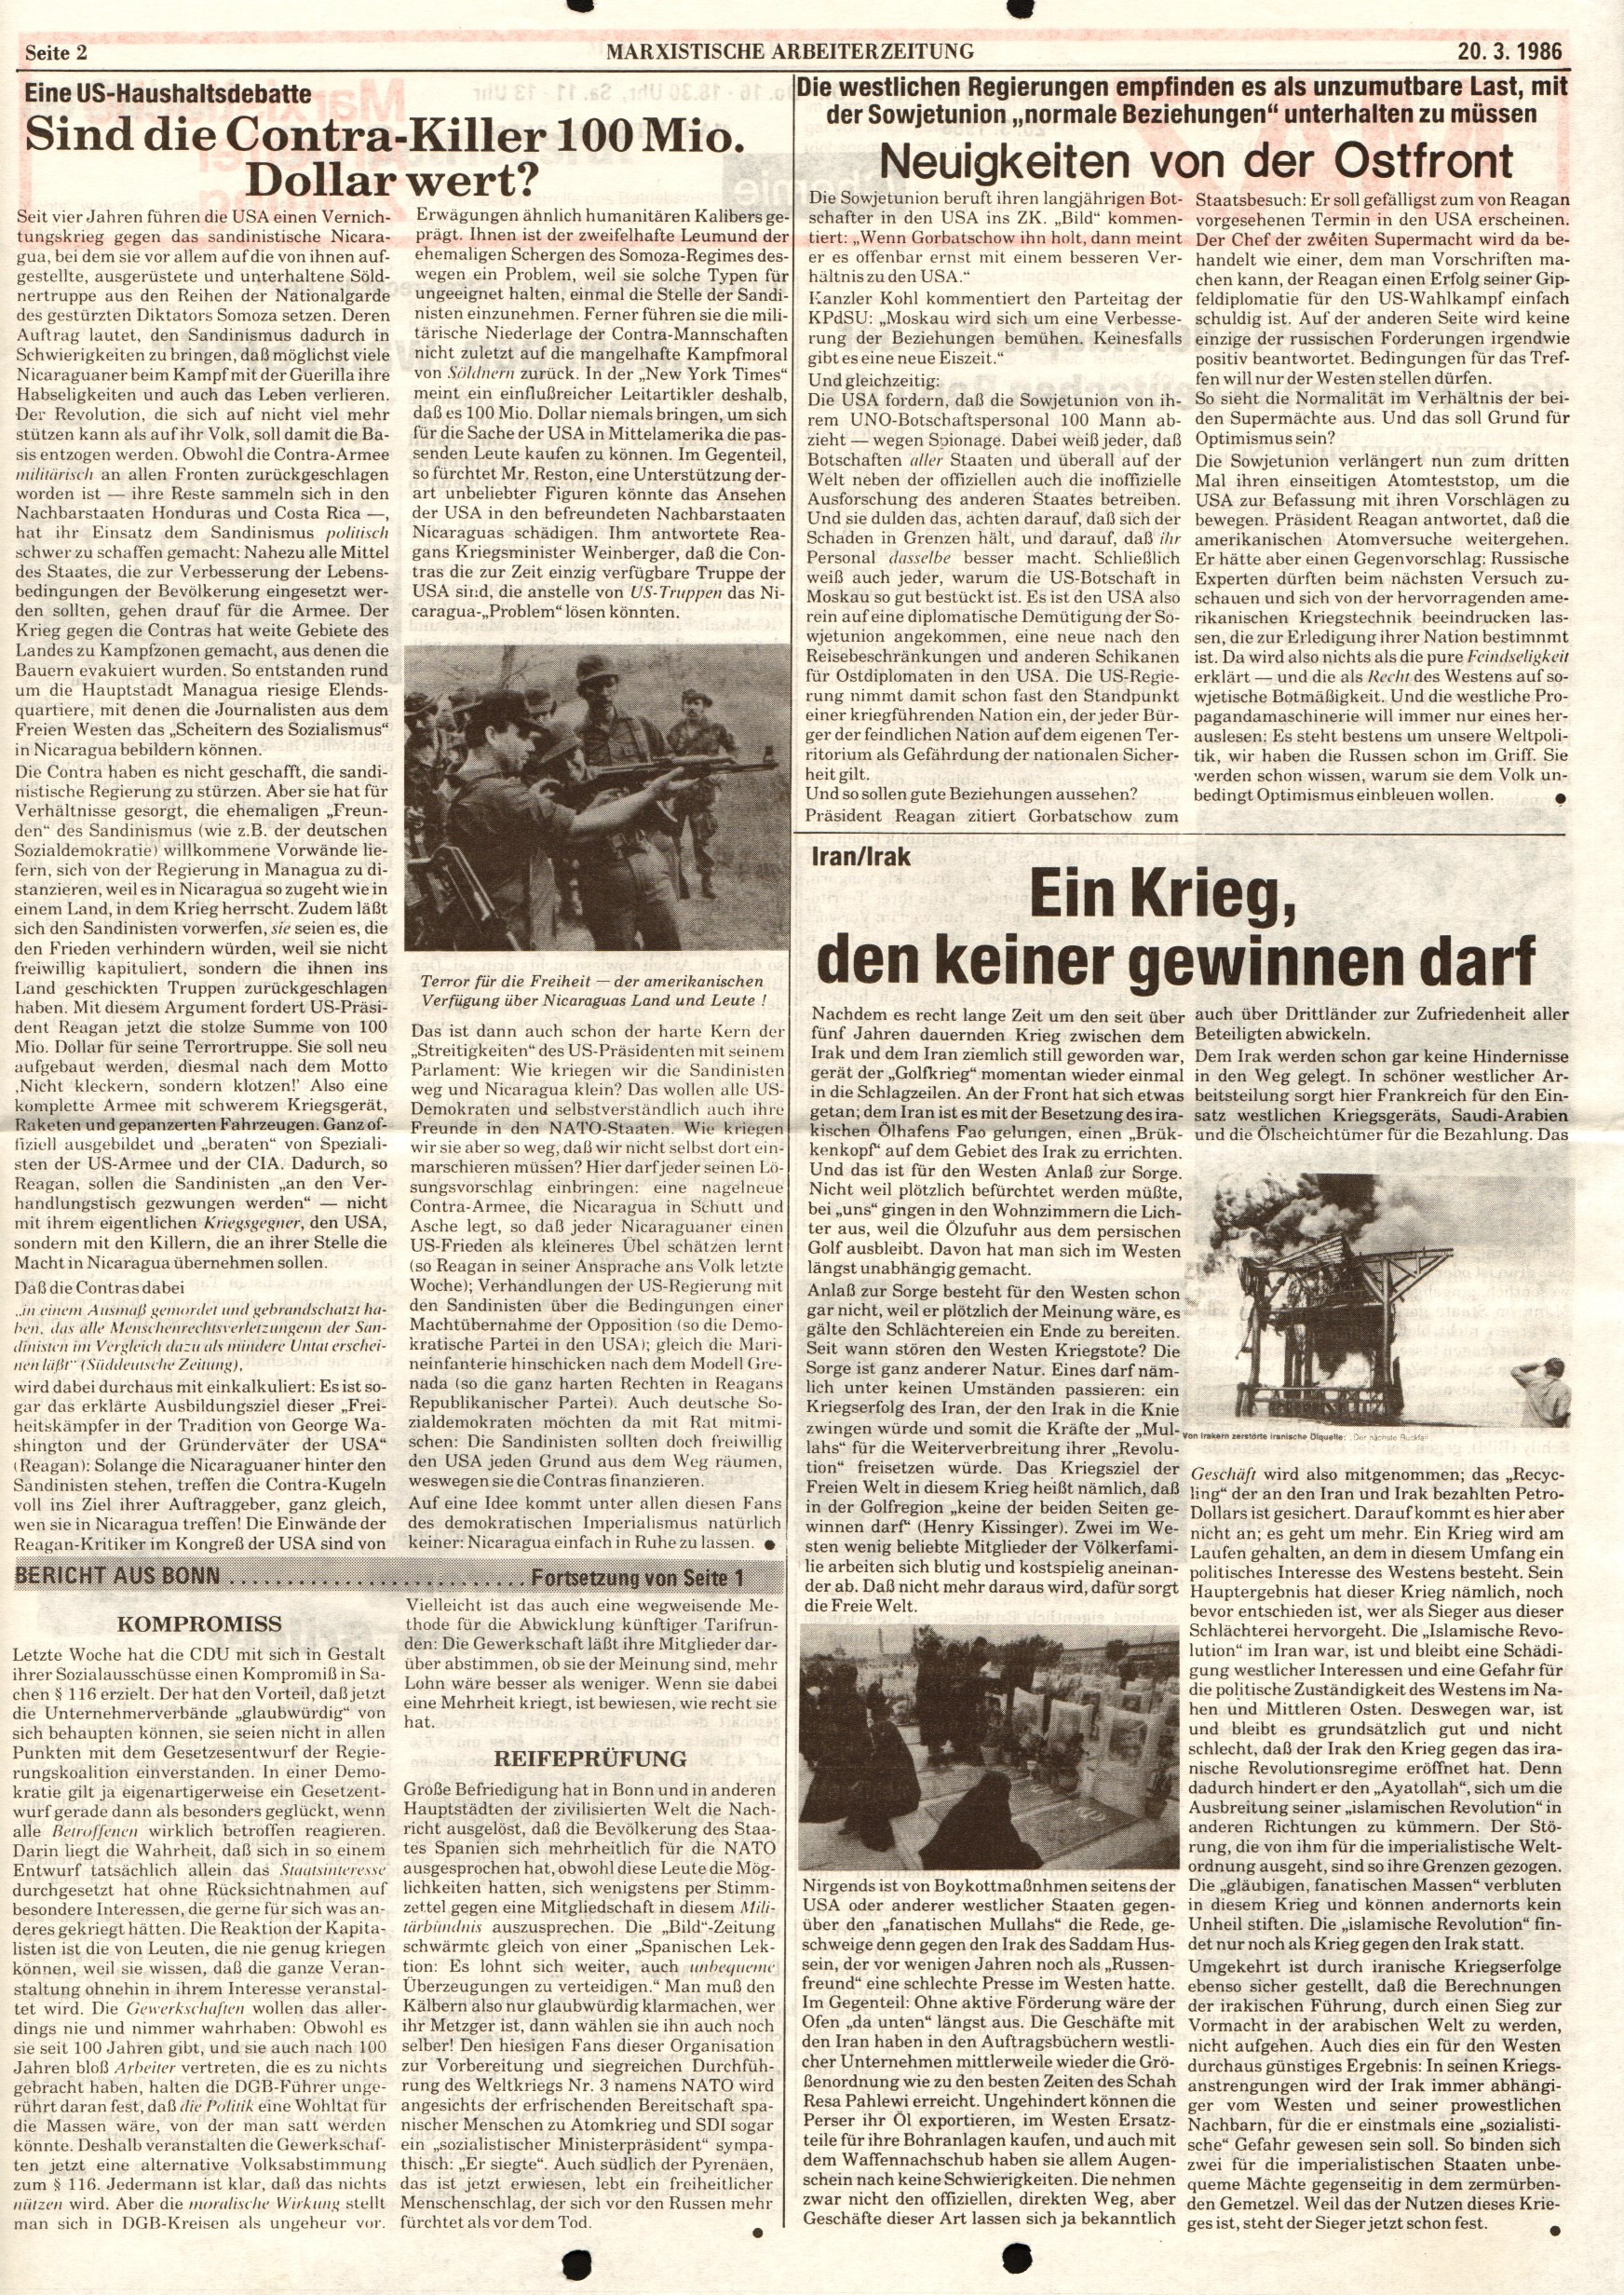 Frankfurt_CPK_Hoechst_MAZ368